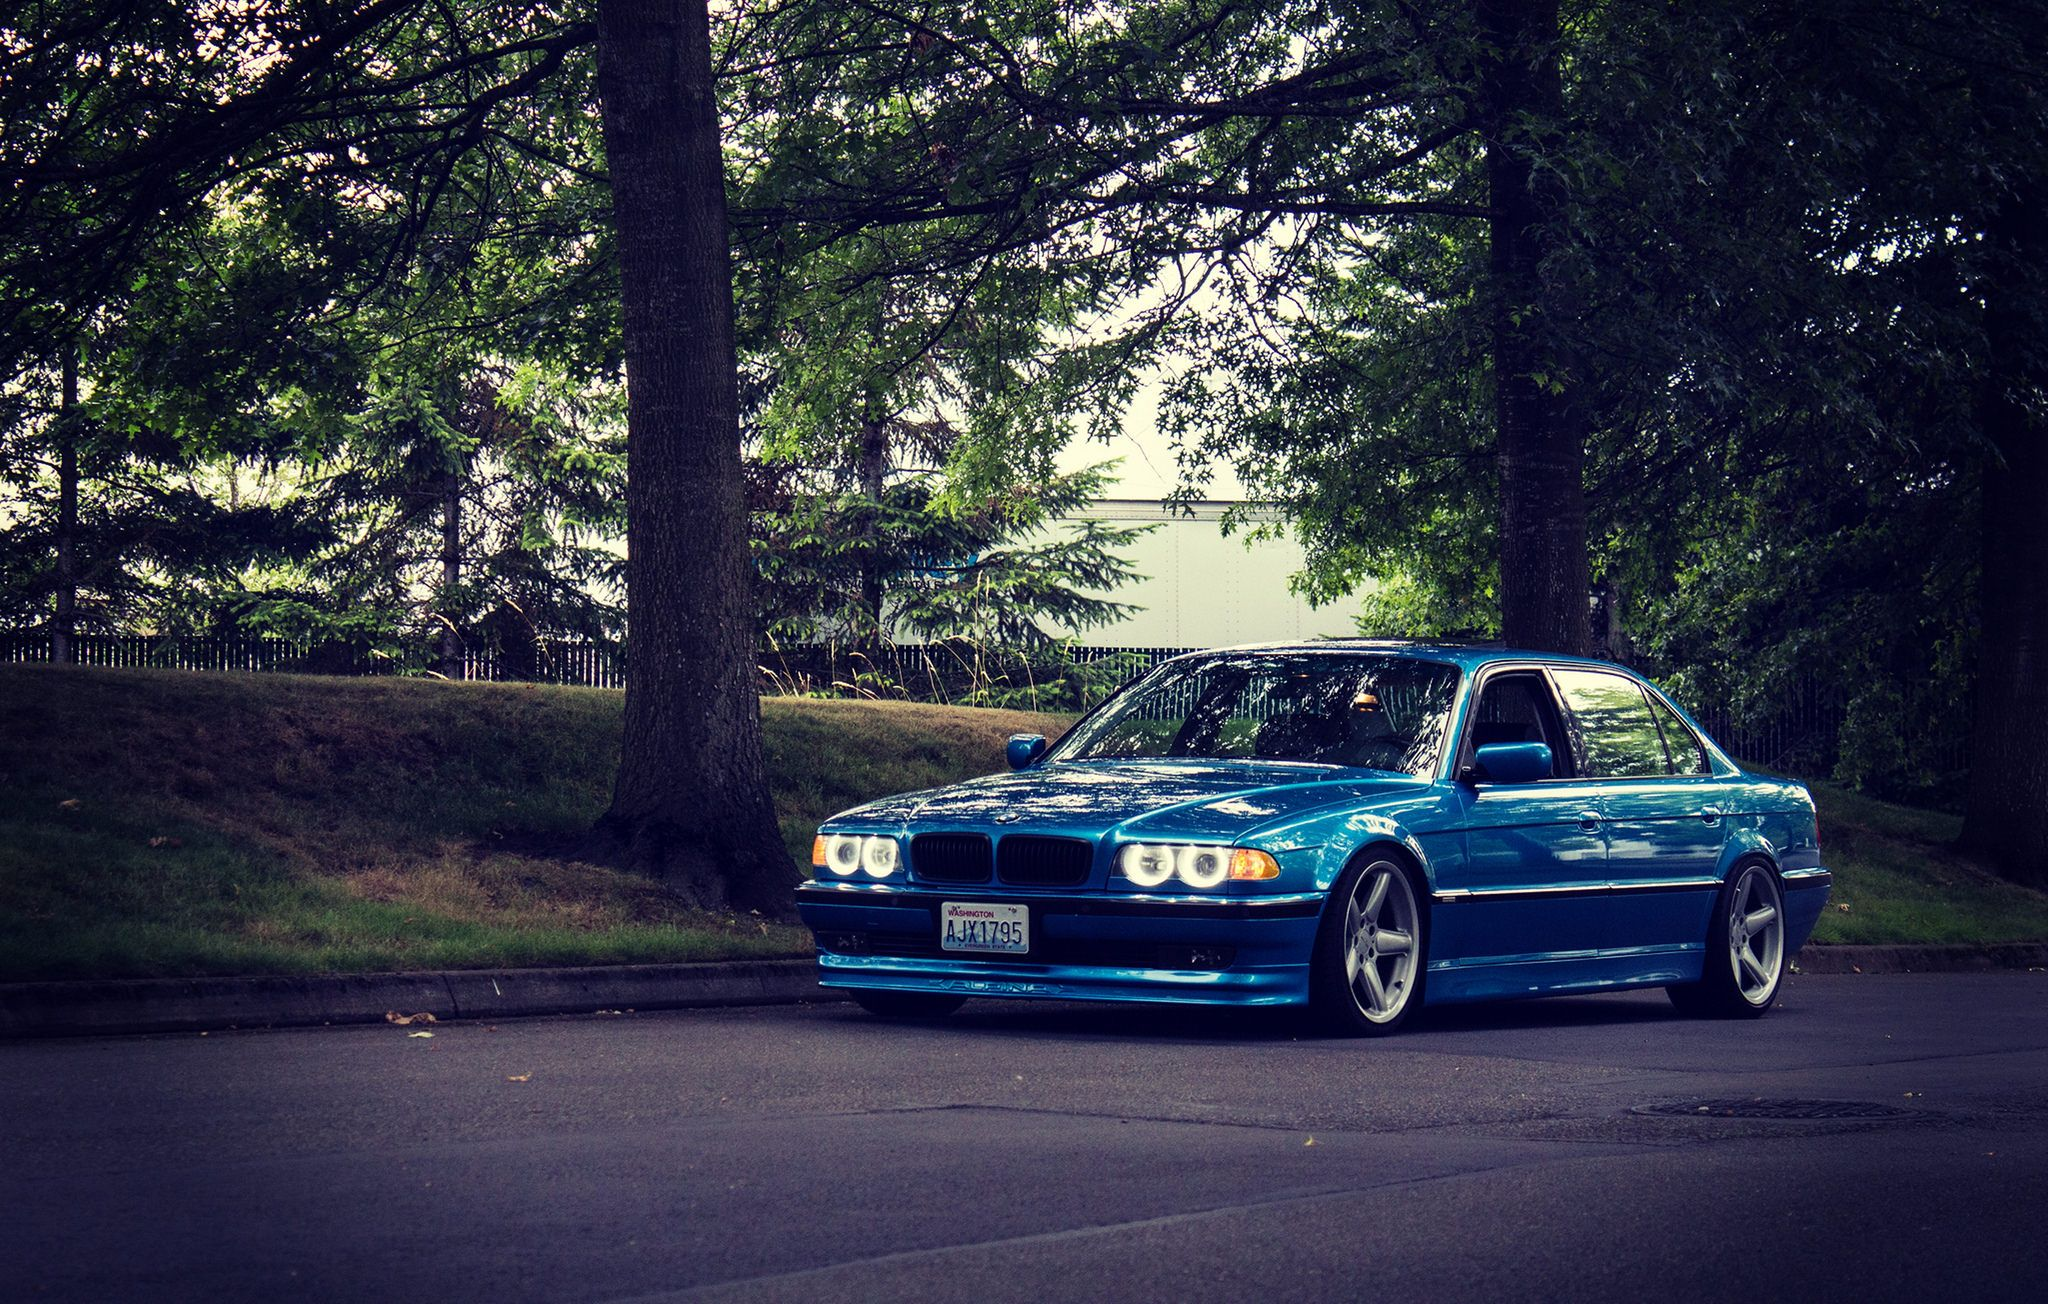 Bmw 7 Series E38 Low Bmw E38 Bmw 7 Series Bmw Blue